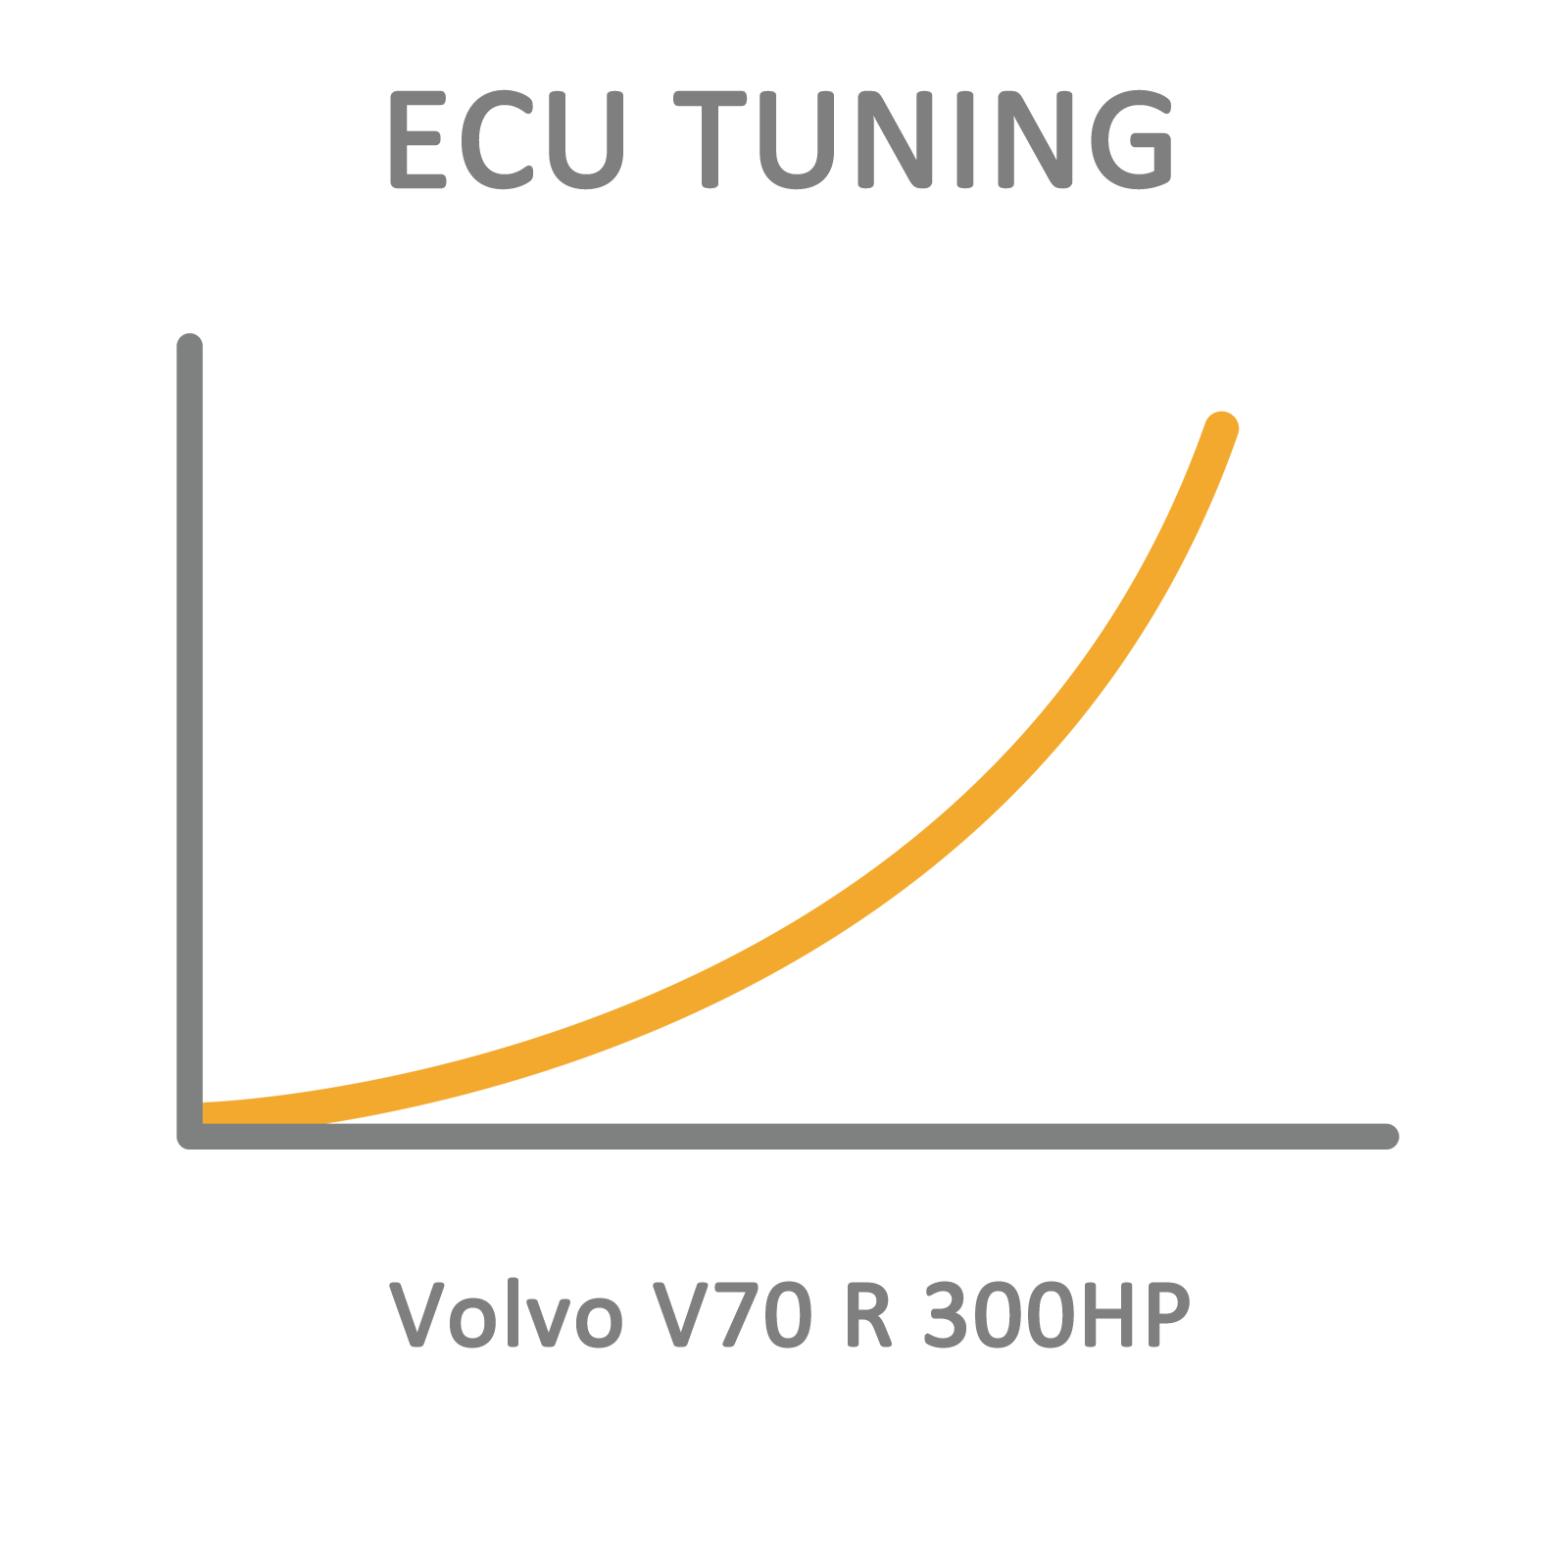 Volvo V70 R 300HP ECU Tuning Remapping Programming